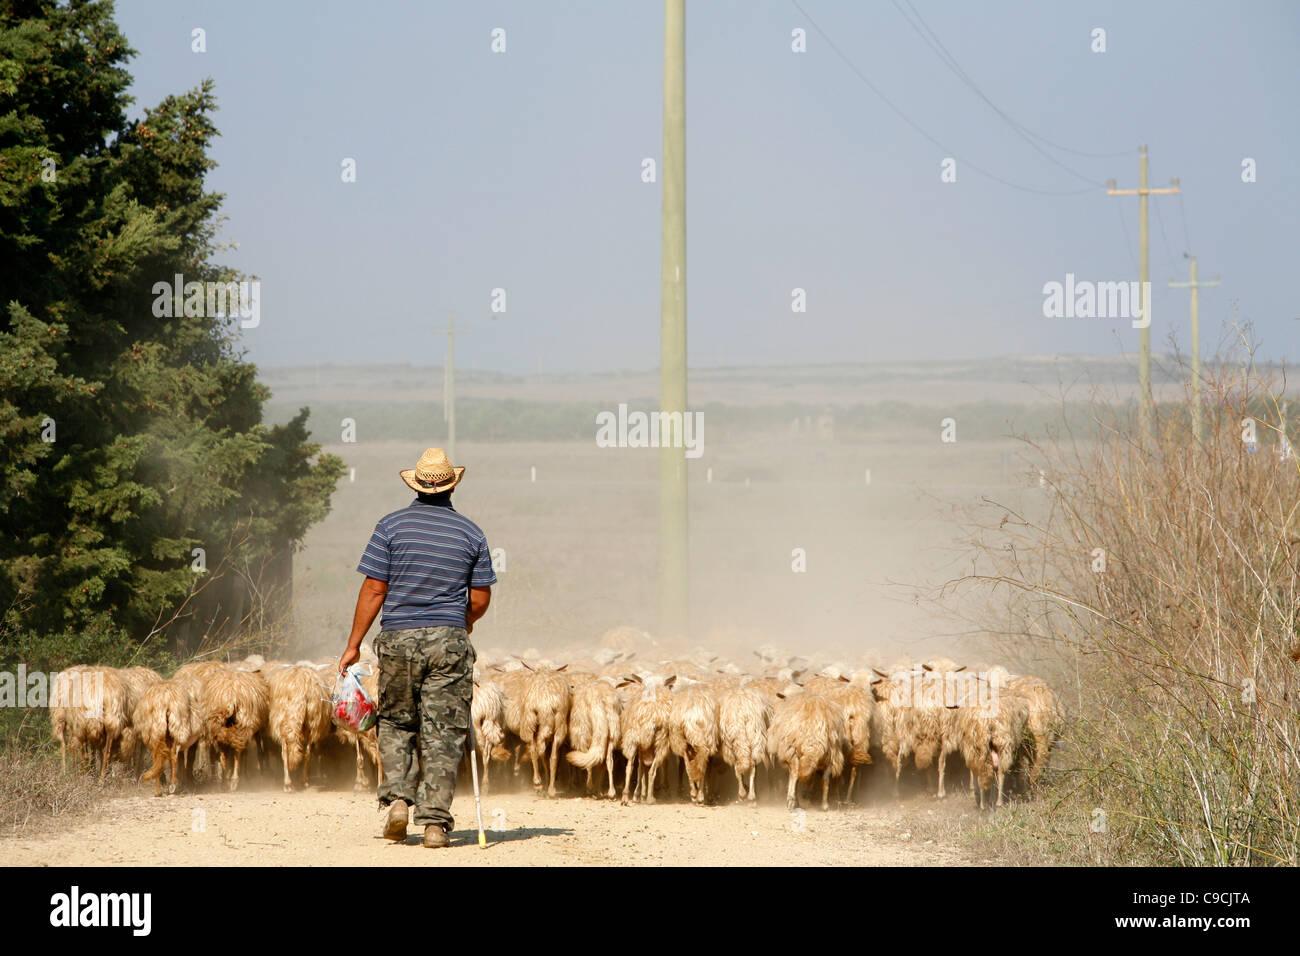 Pecore herder nel west coast ,Sardegna, Italia. Immagini Stock